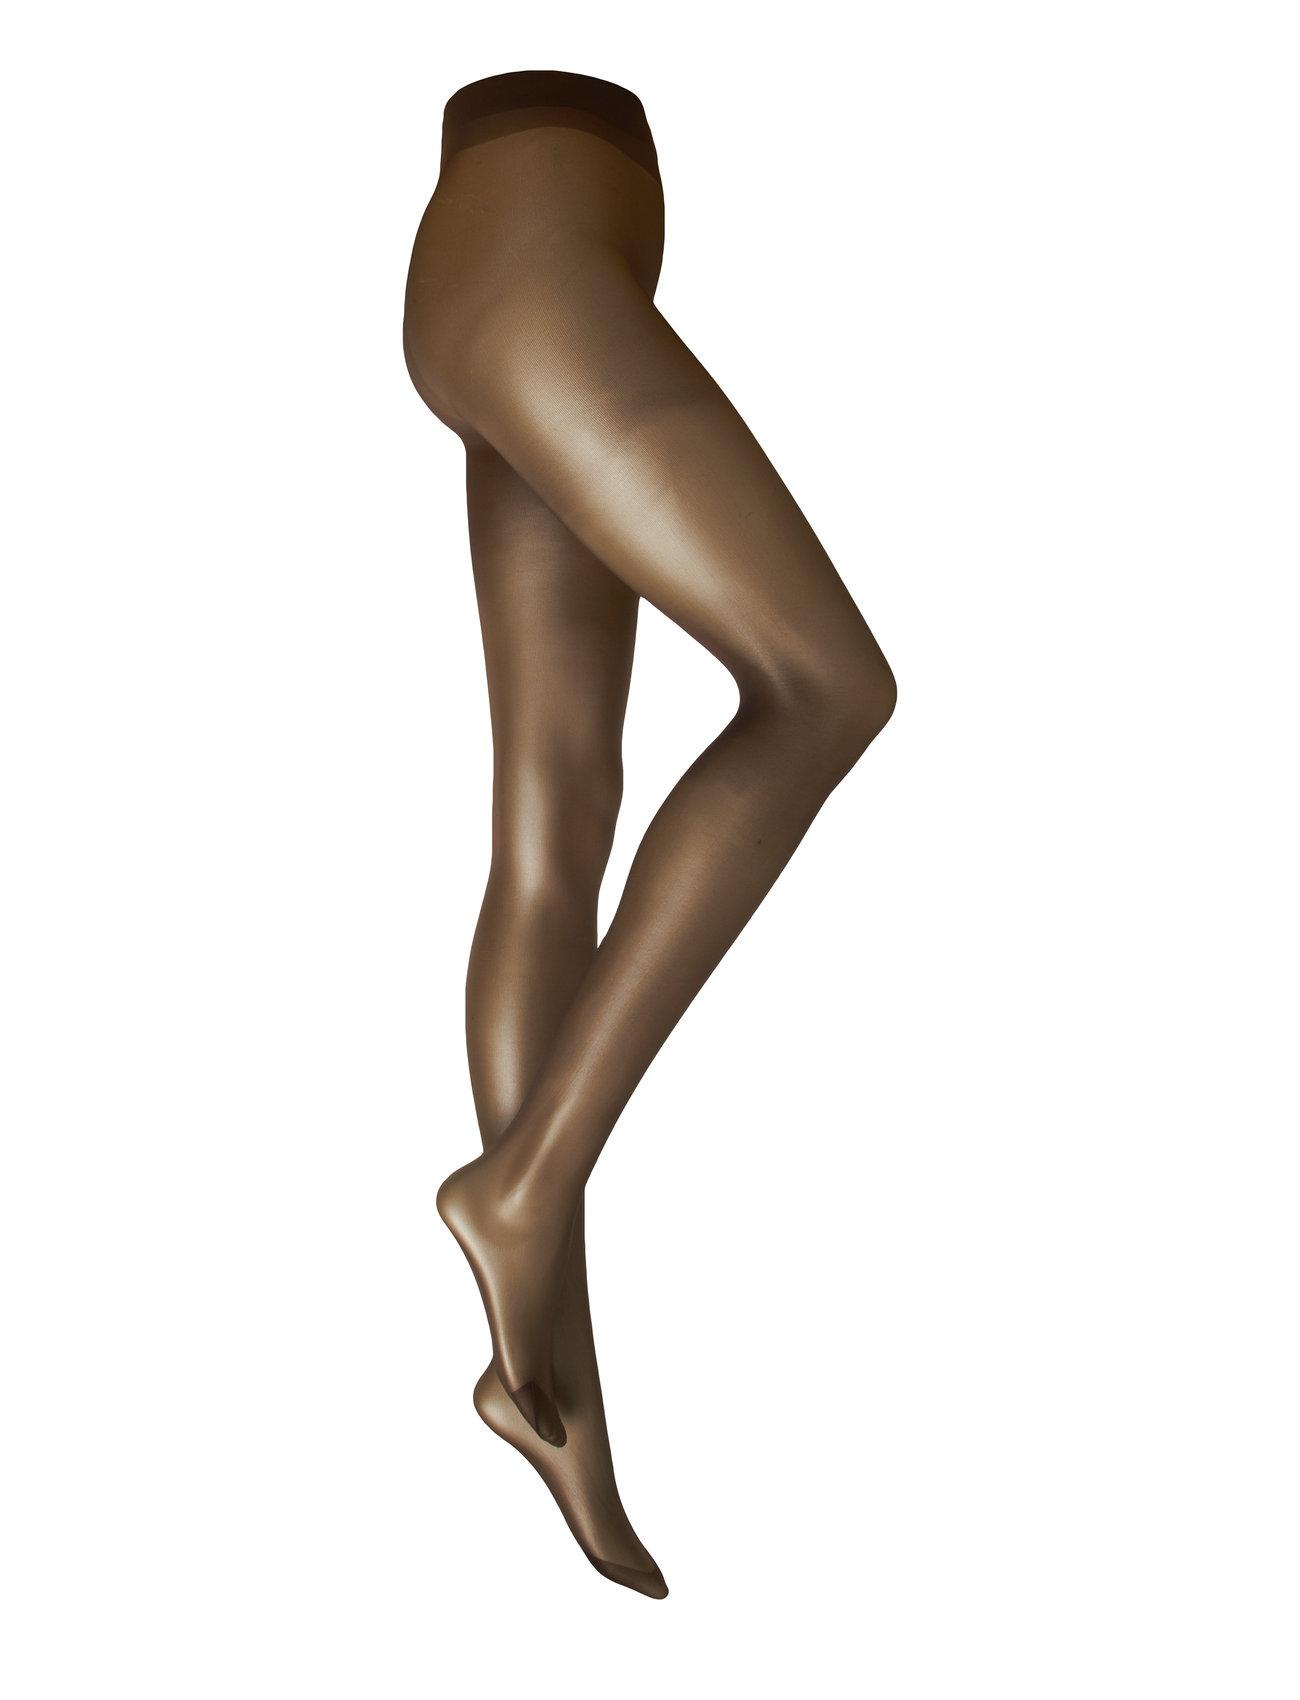 Swedish Stockings Elin Premium tights 20D - NUDE DARK